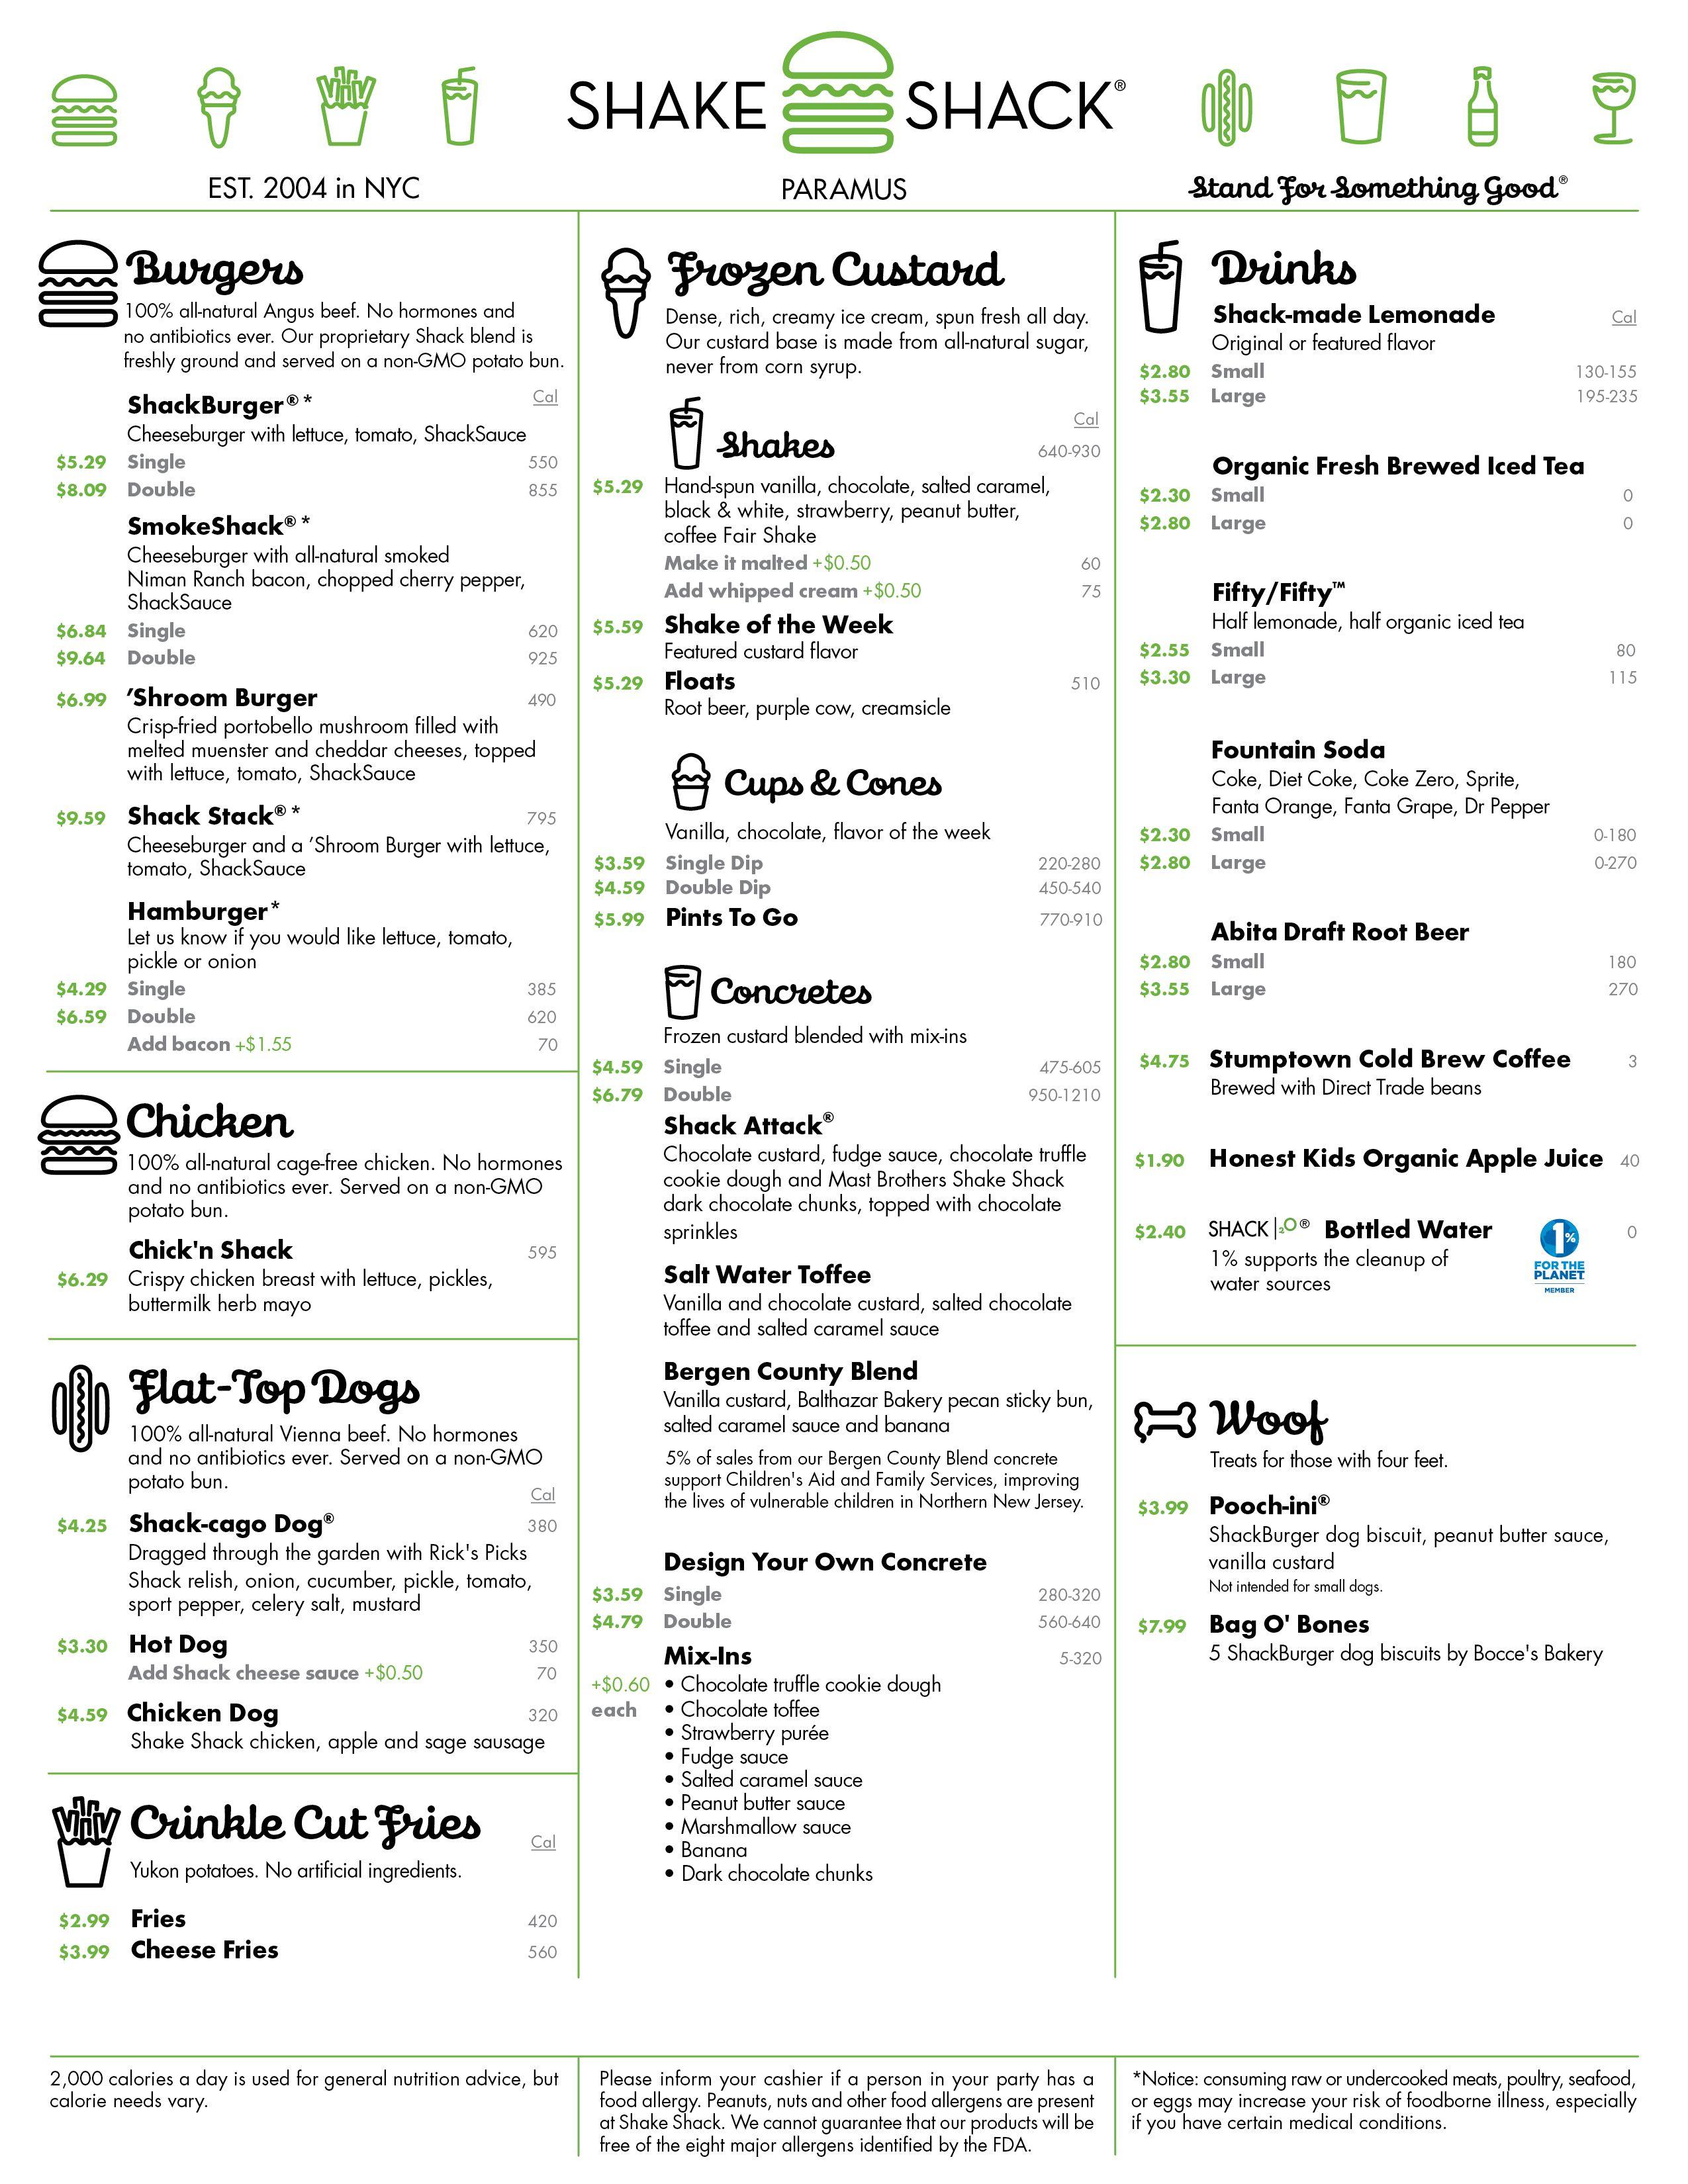 Shake Shack on Rt 17, Paramus | Bergen County Eats | Pinterest ...